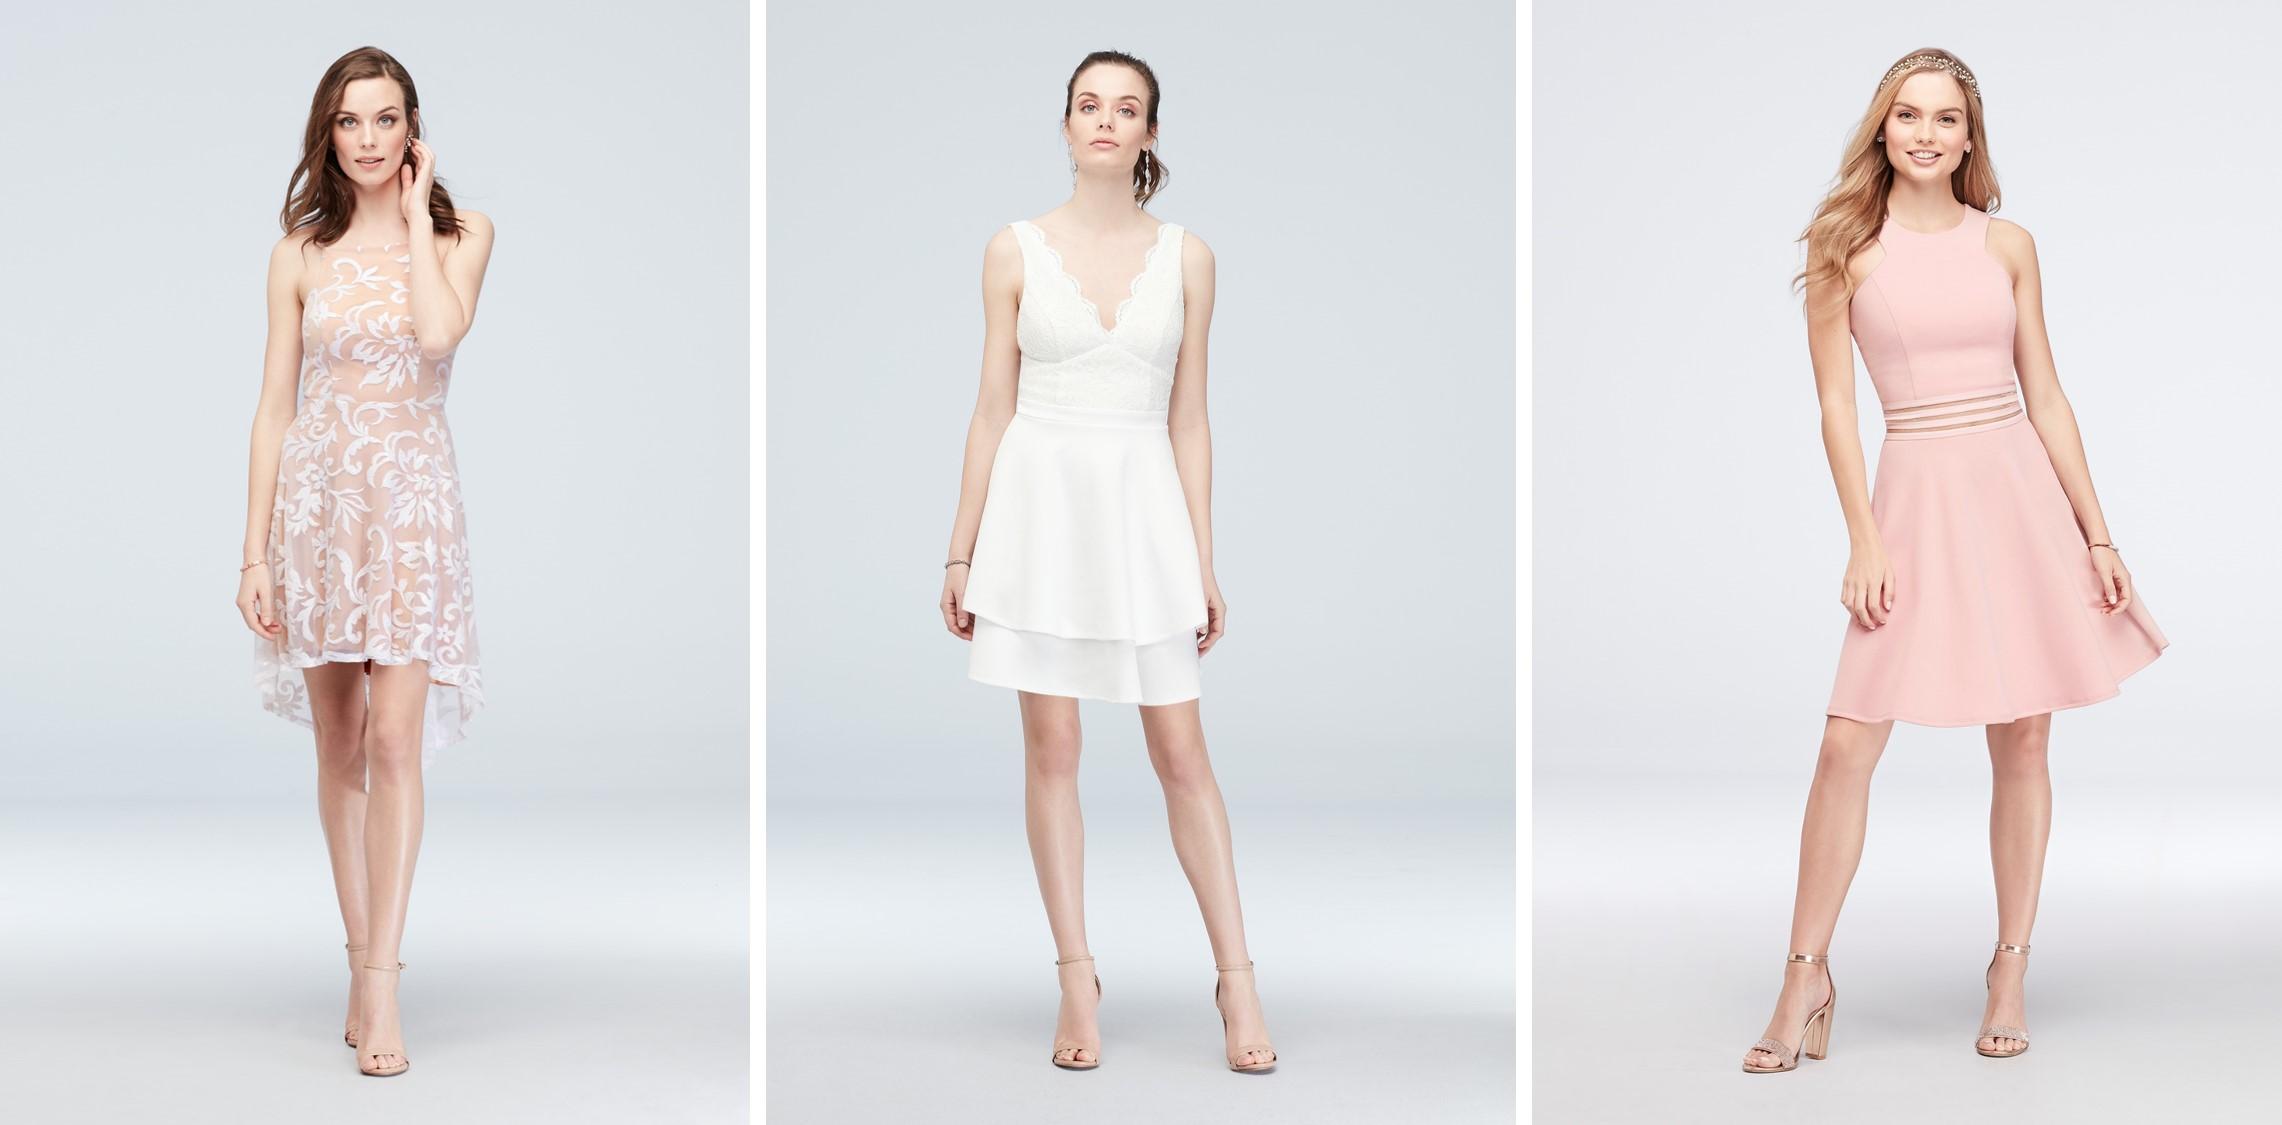 3 models in short white or floral print graduation dresses for 2019